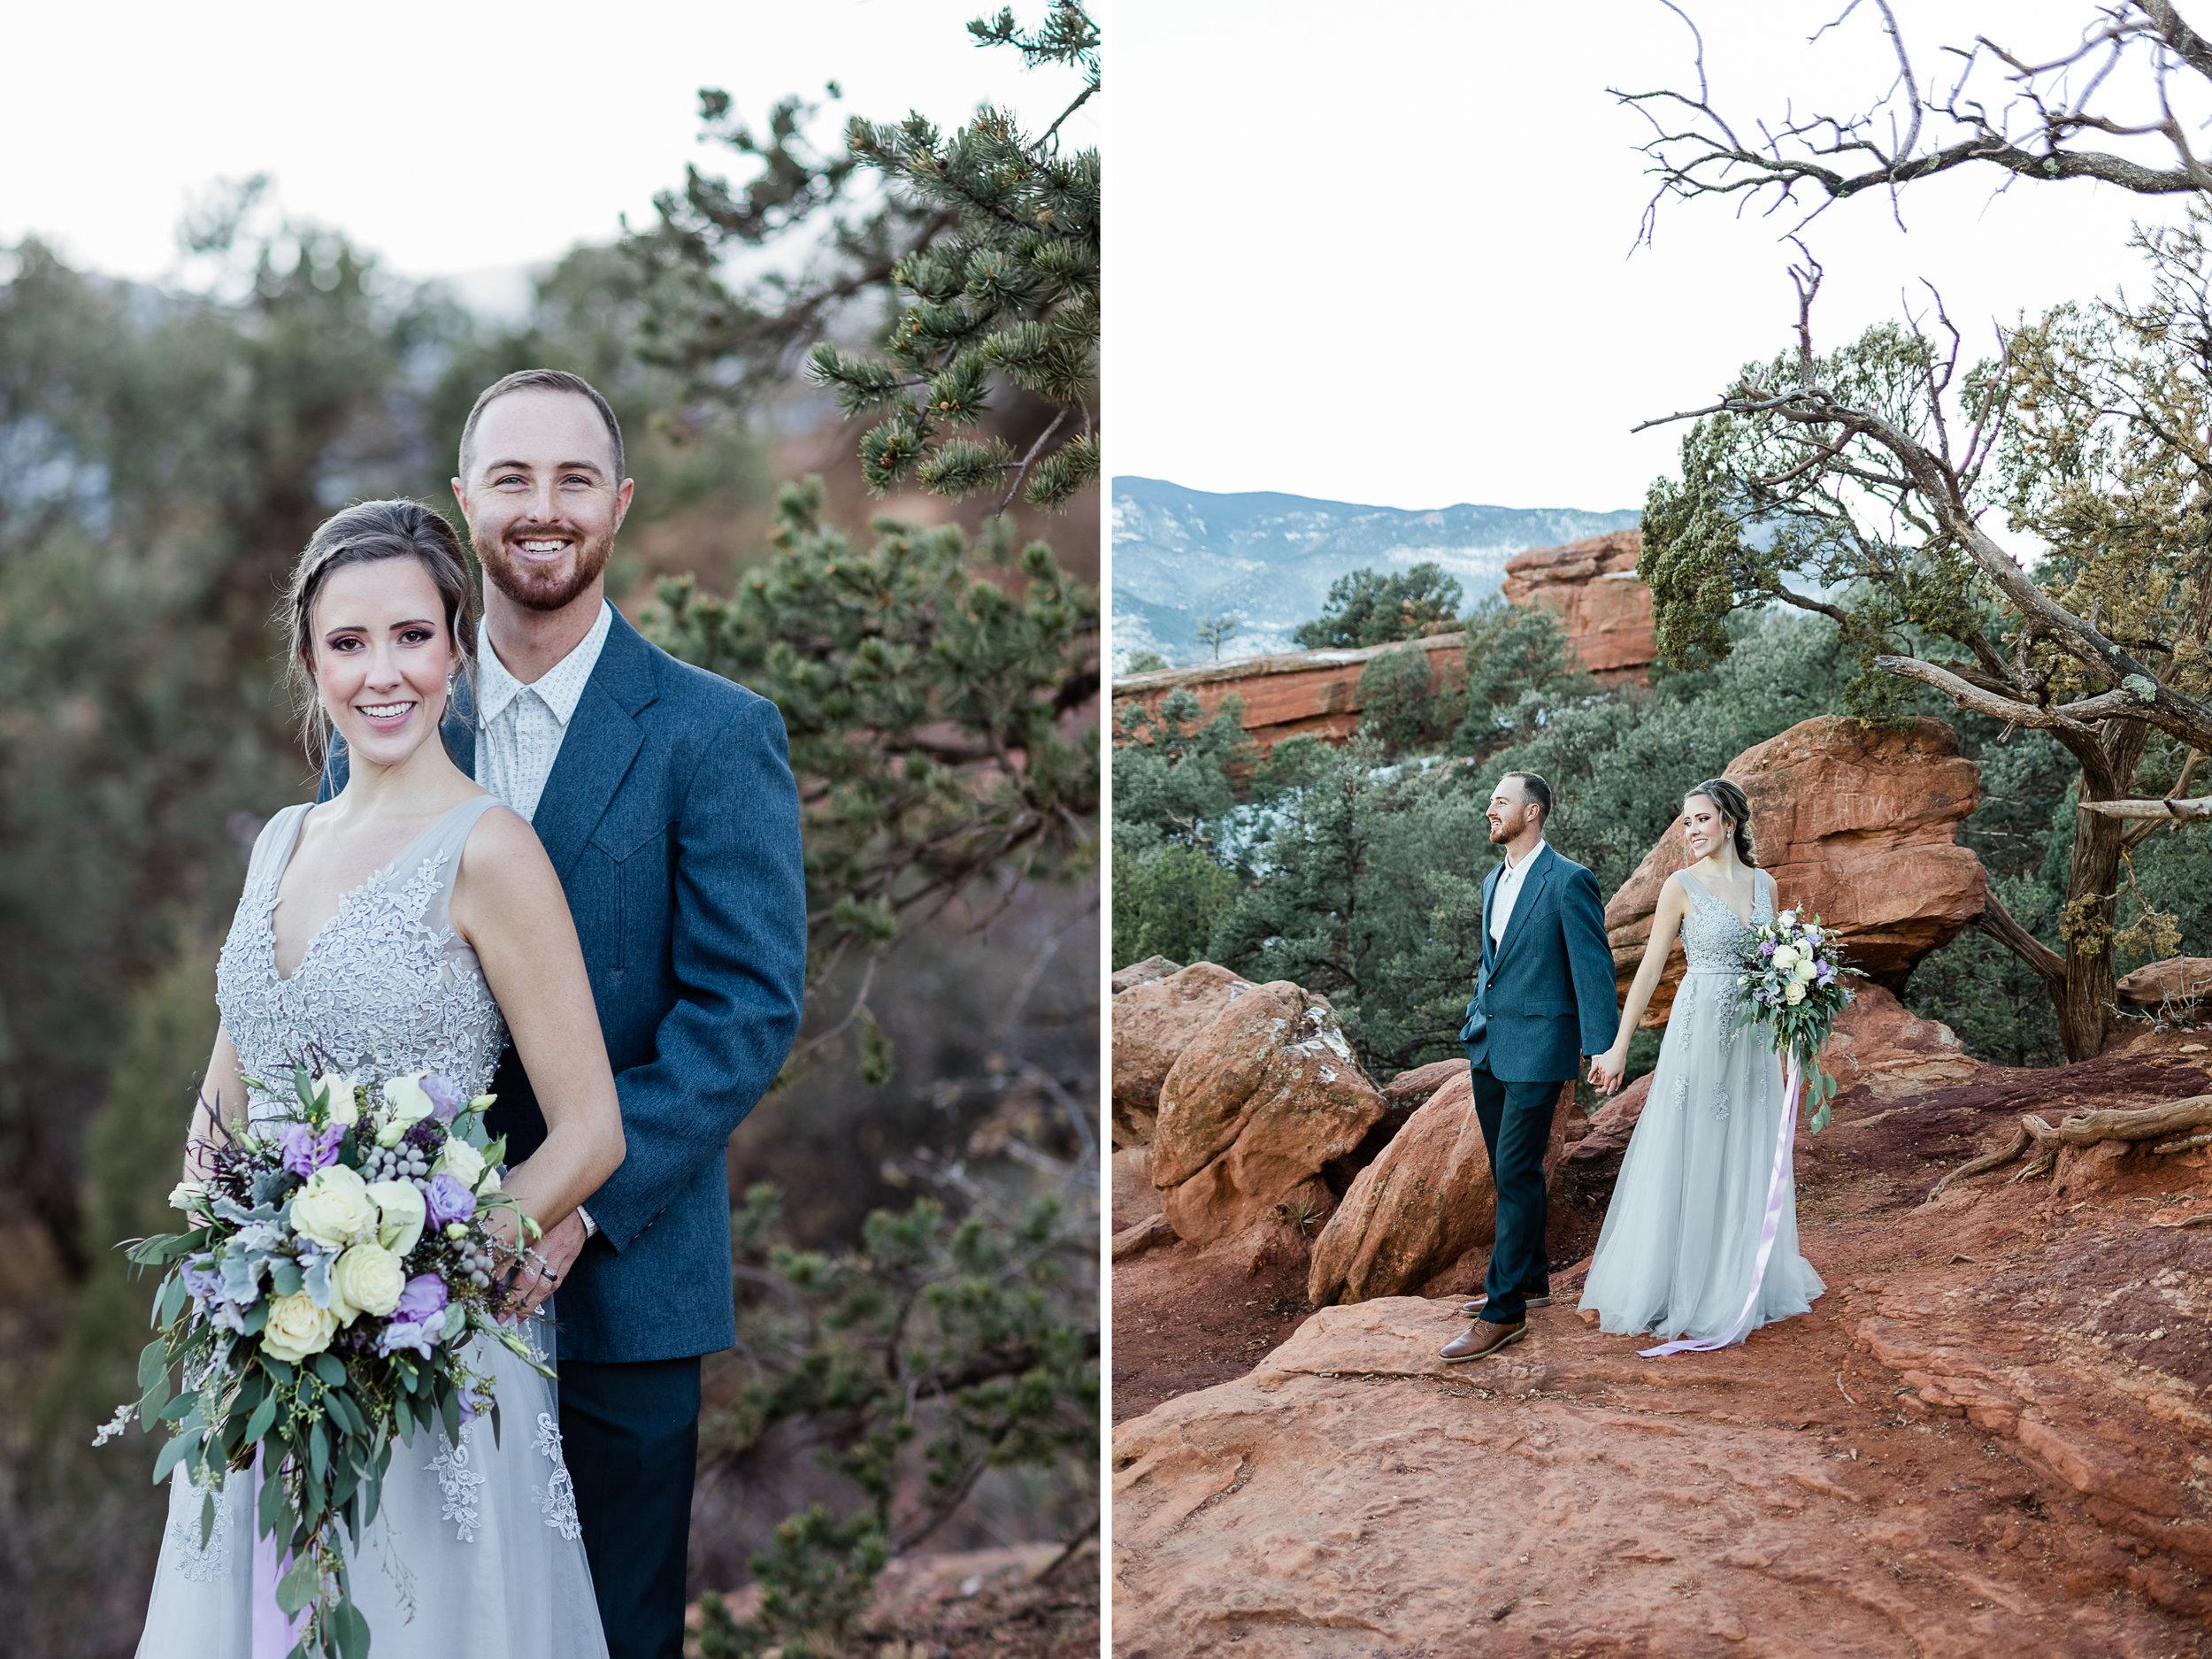 Colorado Springs Wedding Photographer 8.jpg